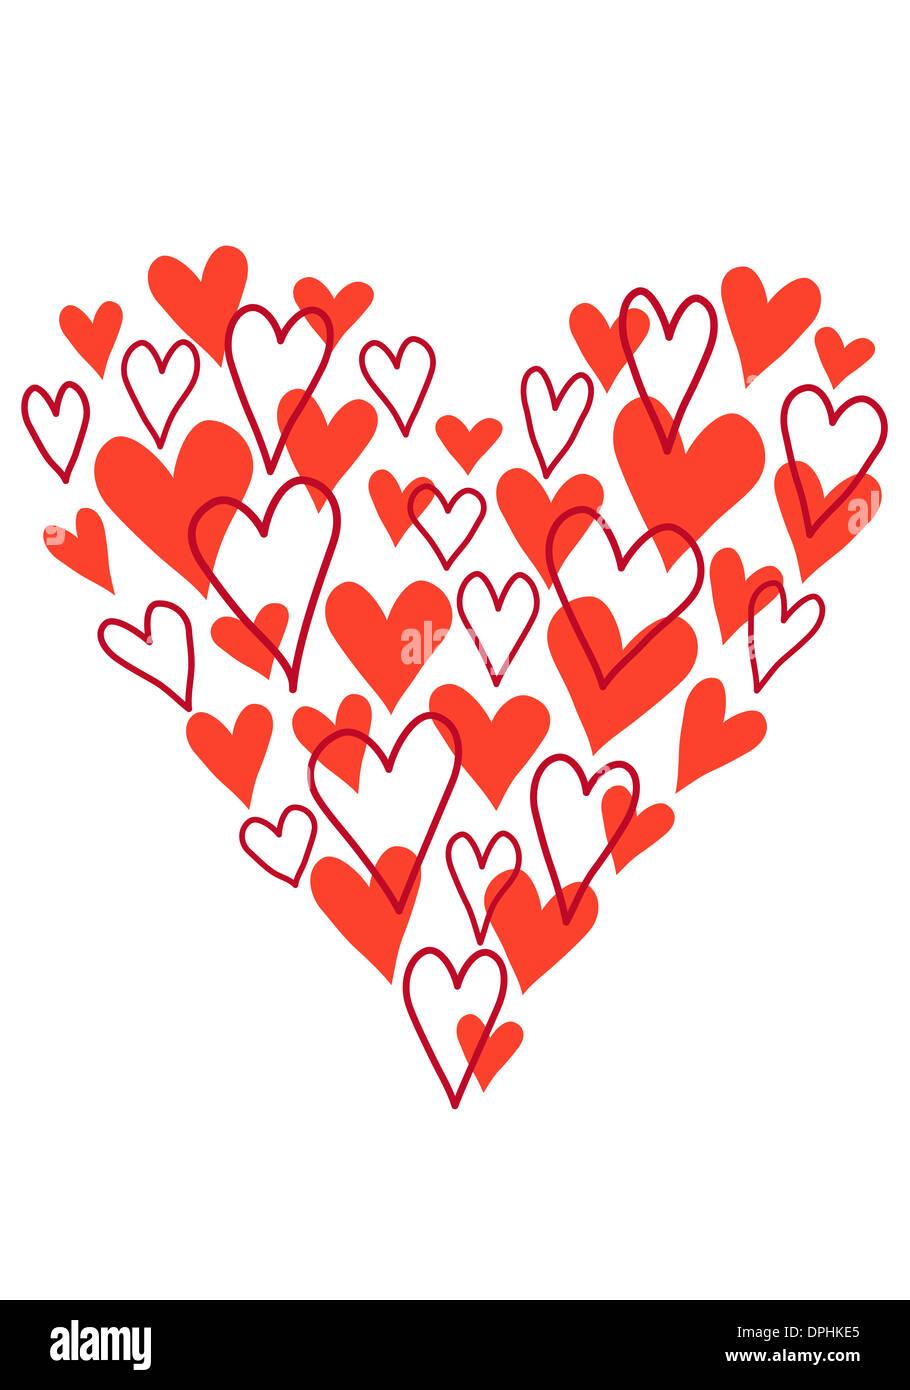 hand drawn scribble heart, vector illustration - Stock Image